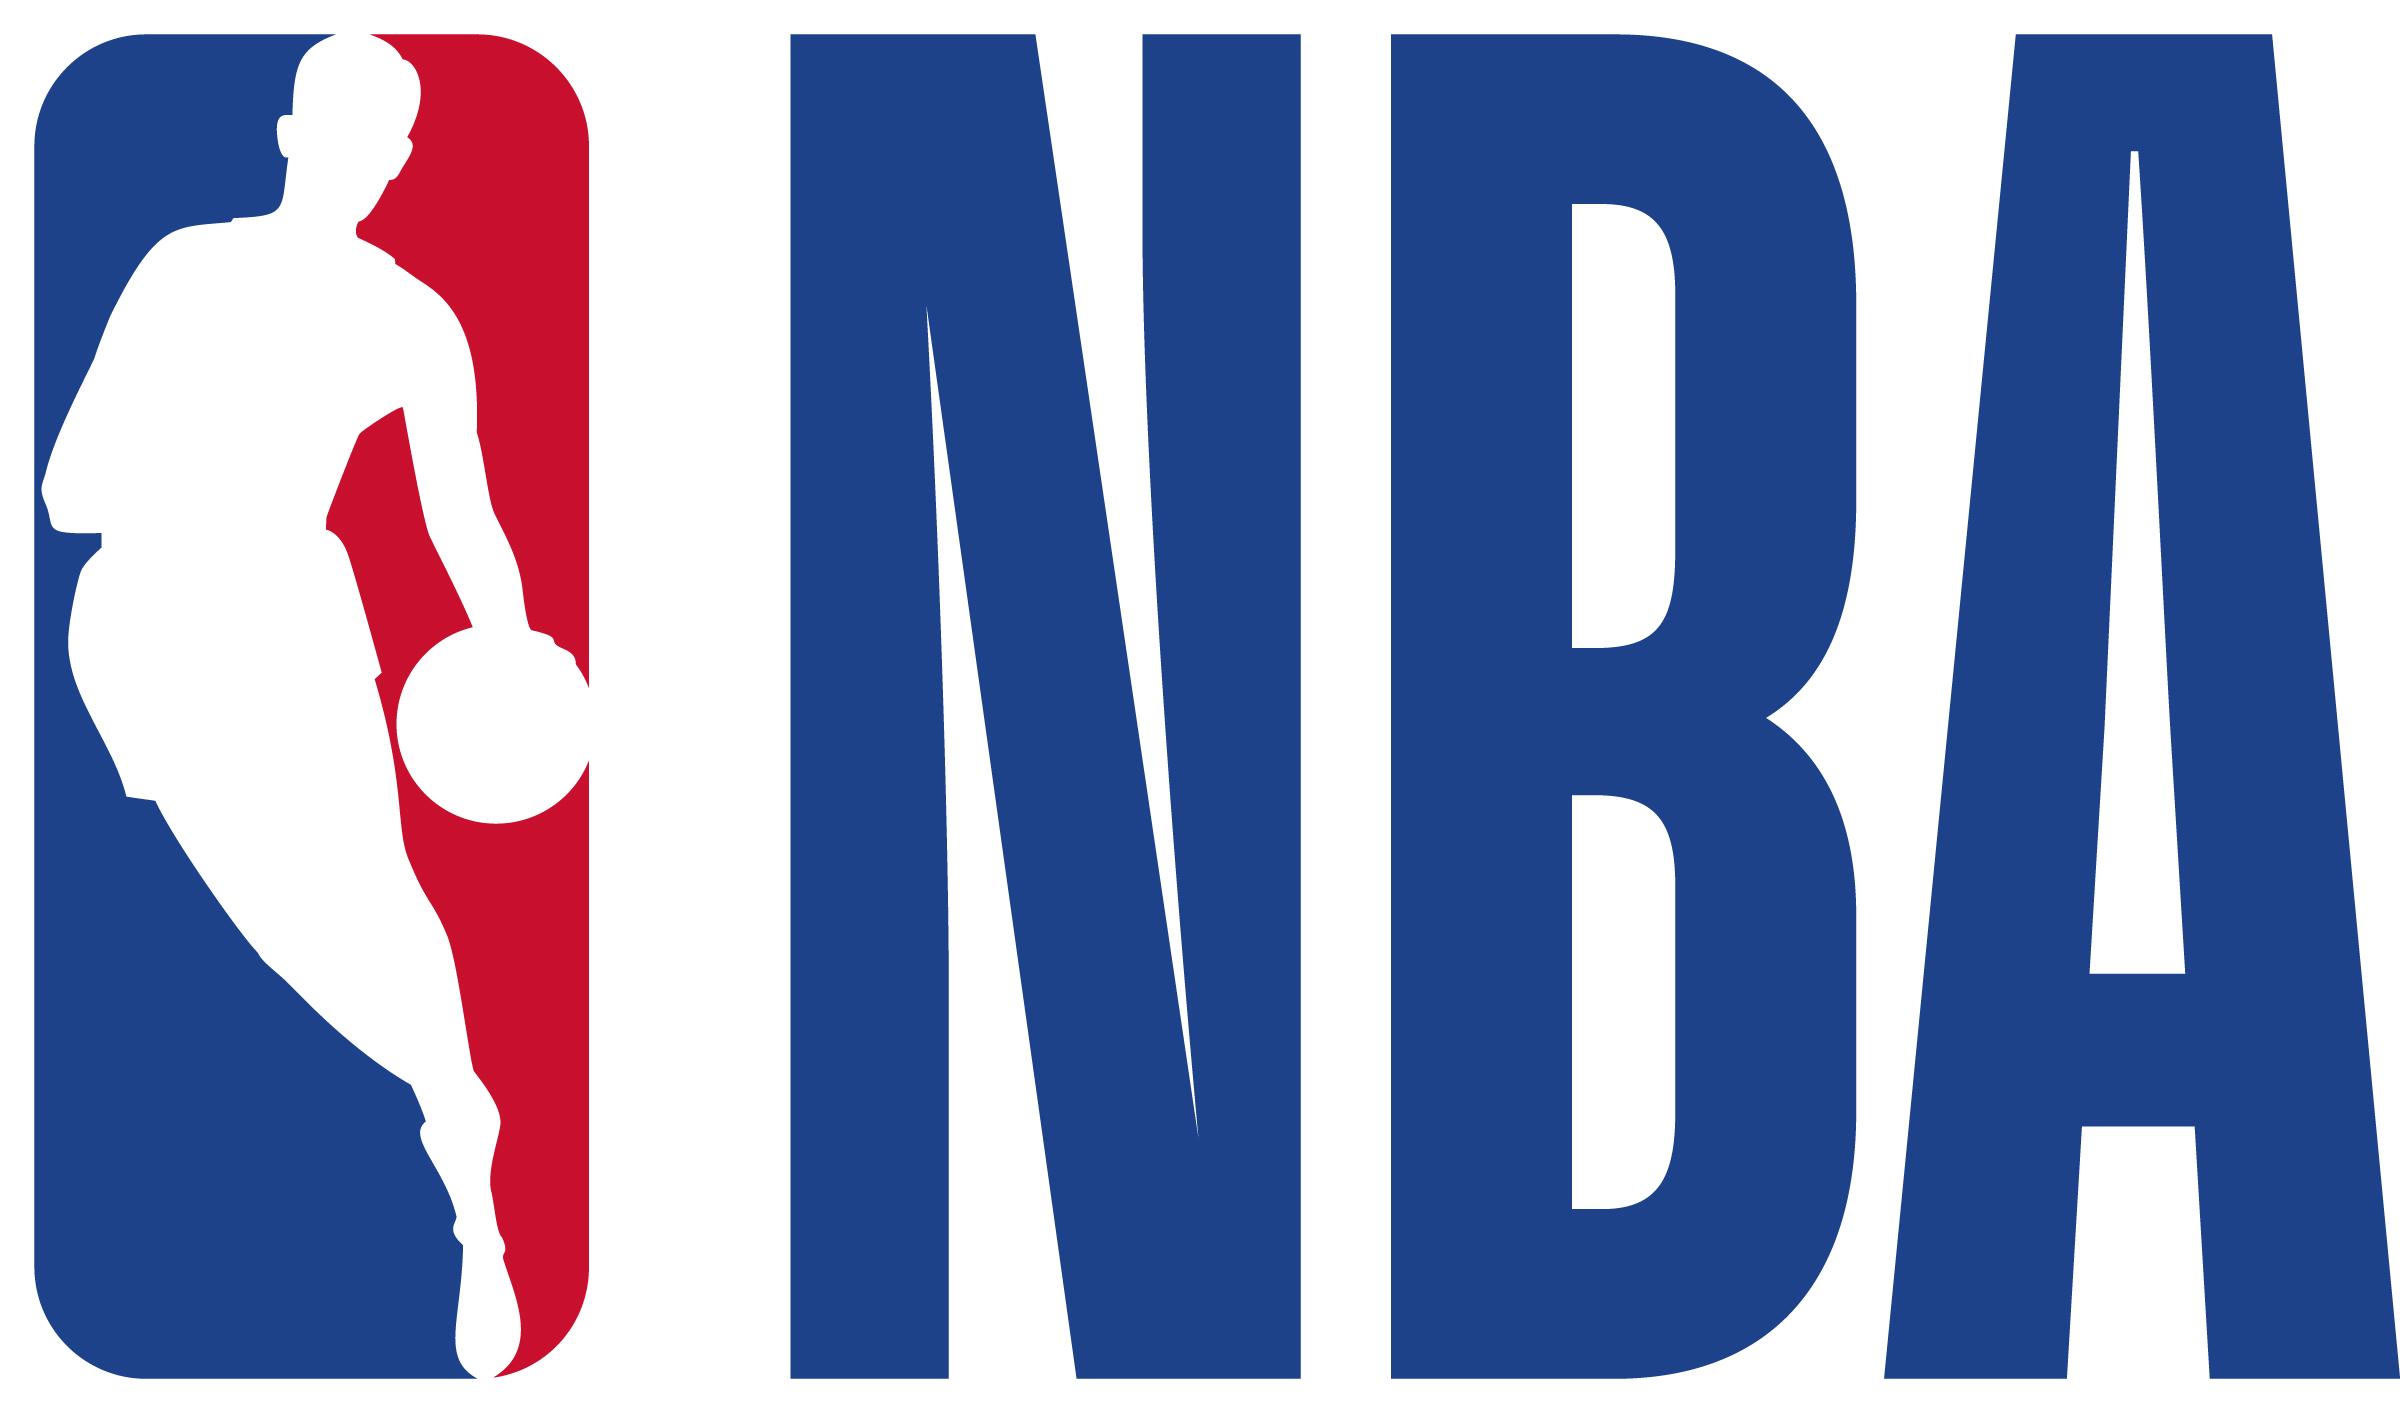 NBA_Logoman_word.jpg